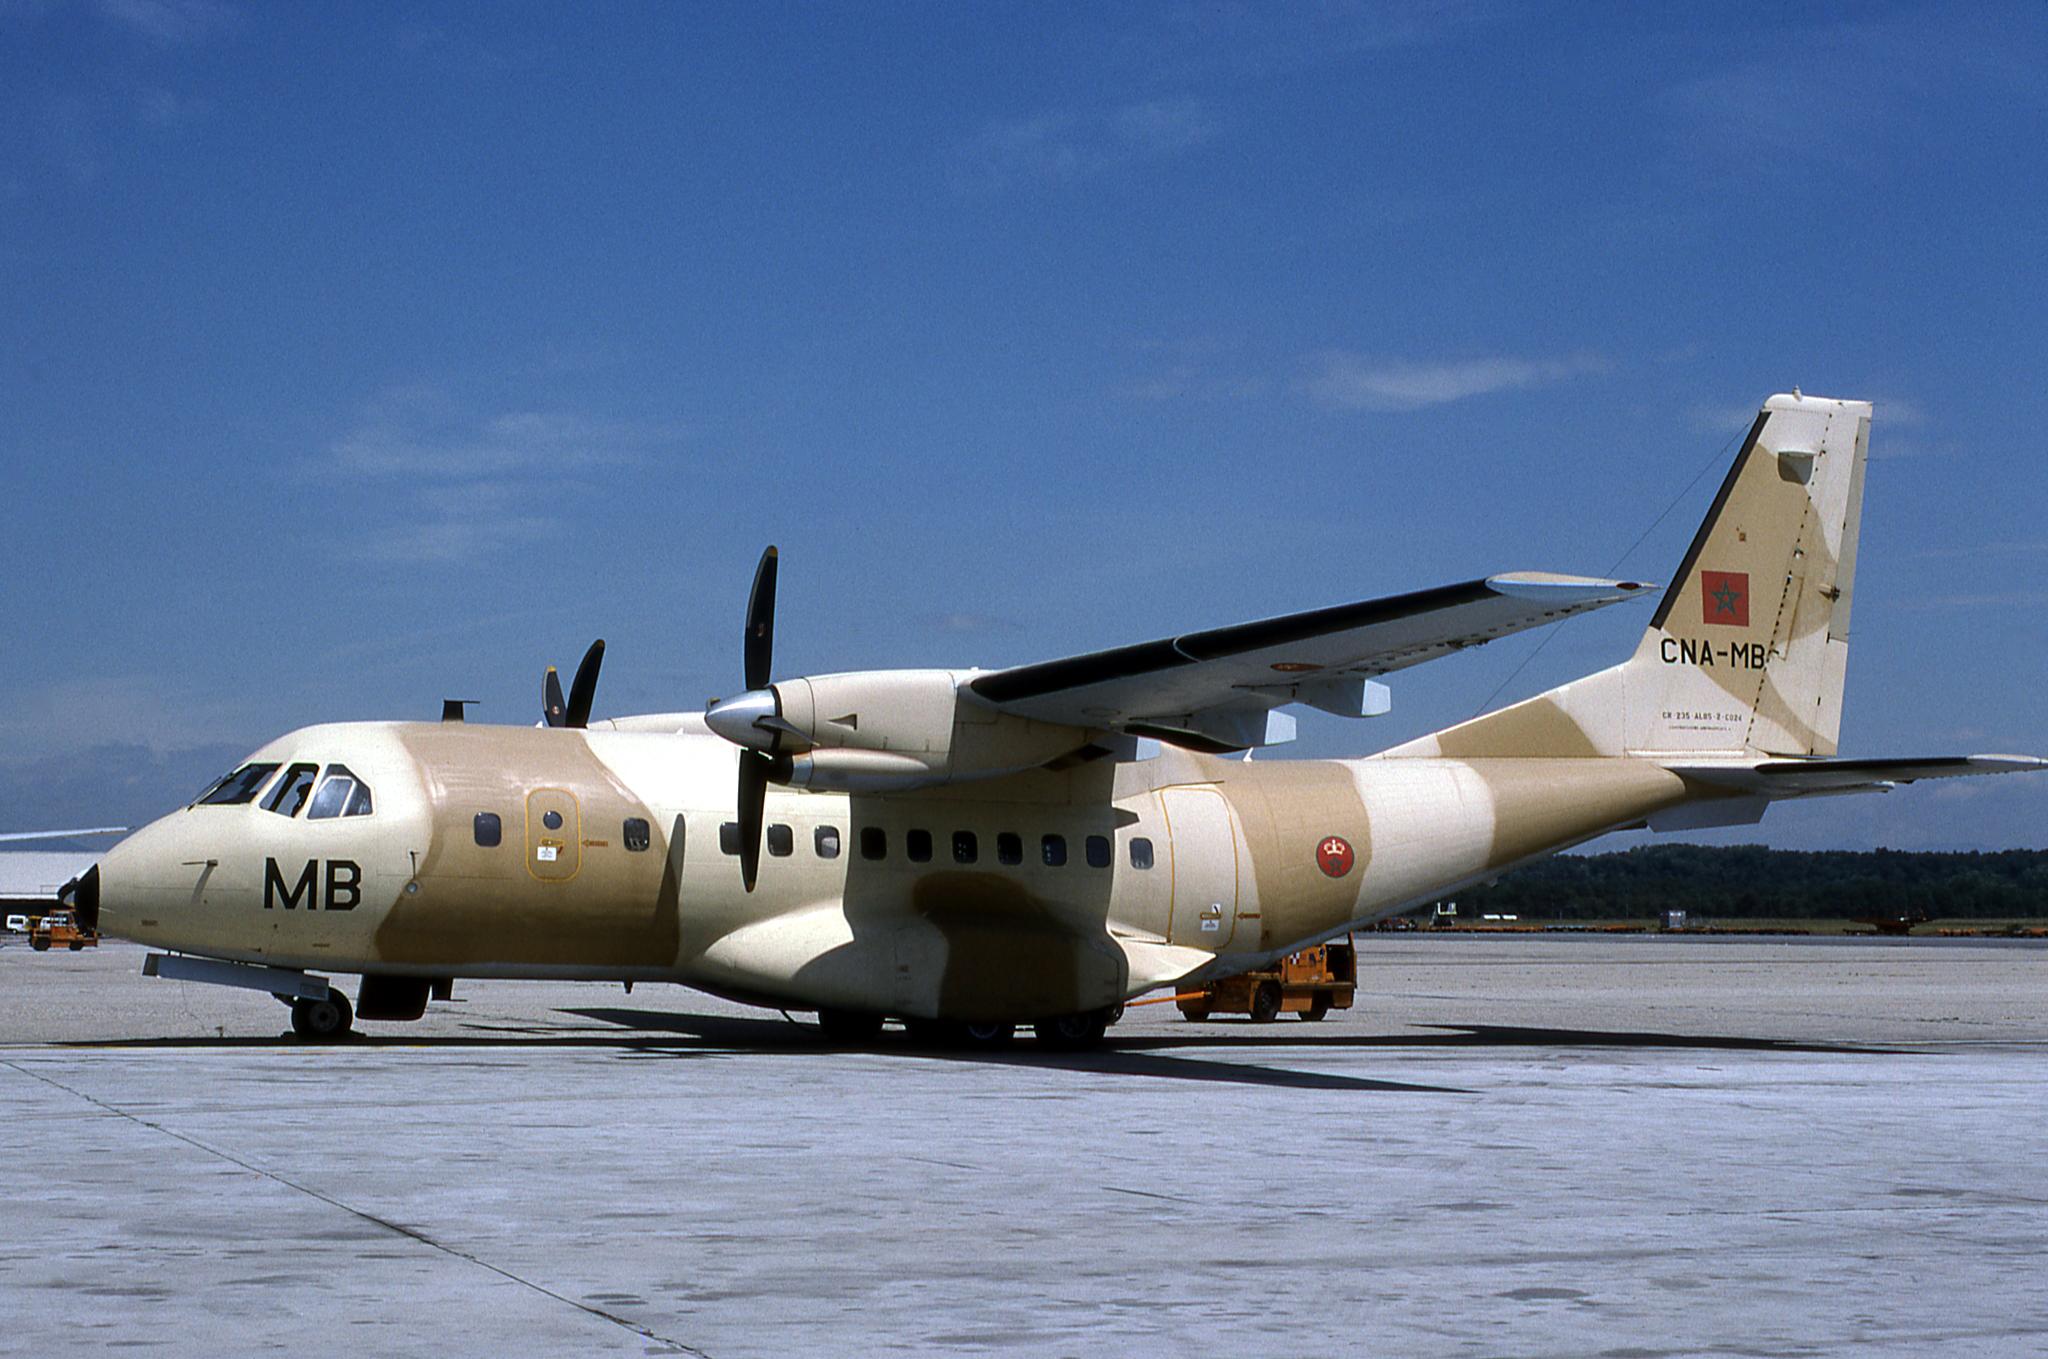 FRA: Photos d'avions de transport - Page 38 46897989475_3680c0b922_o